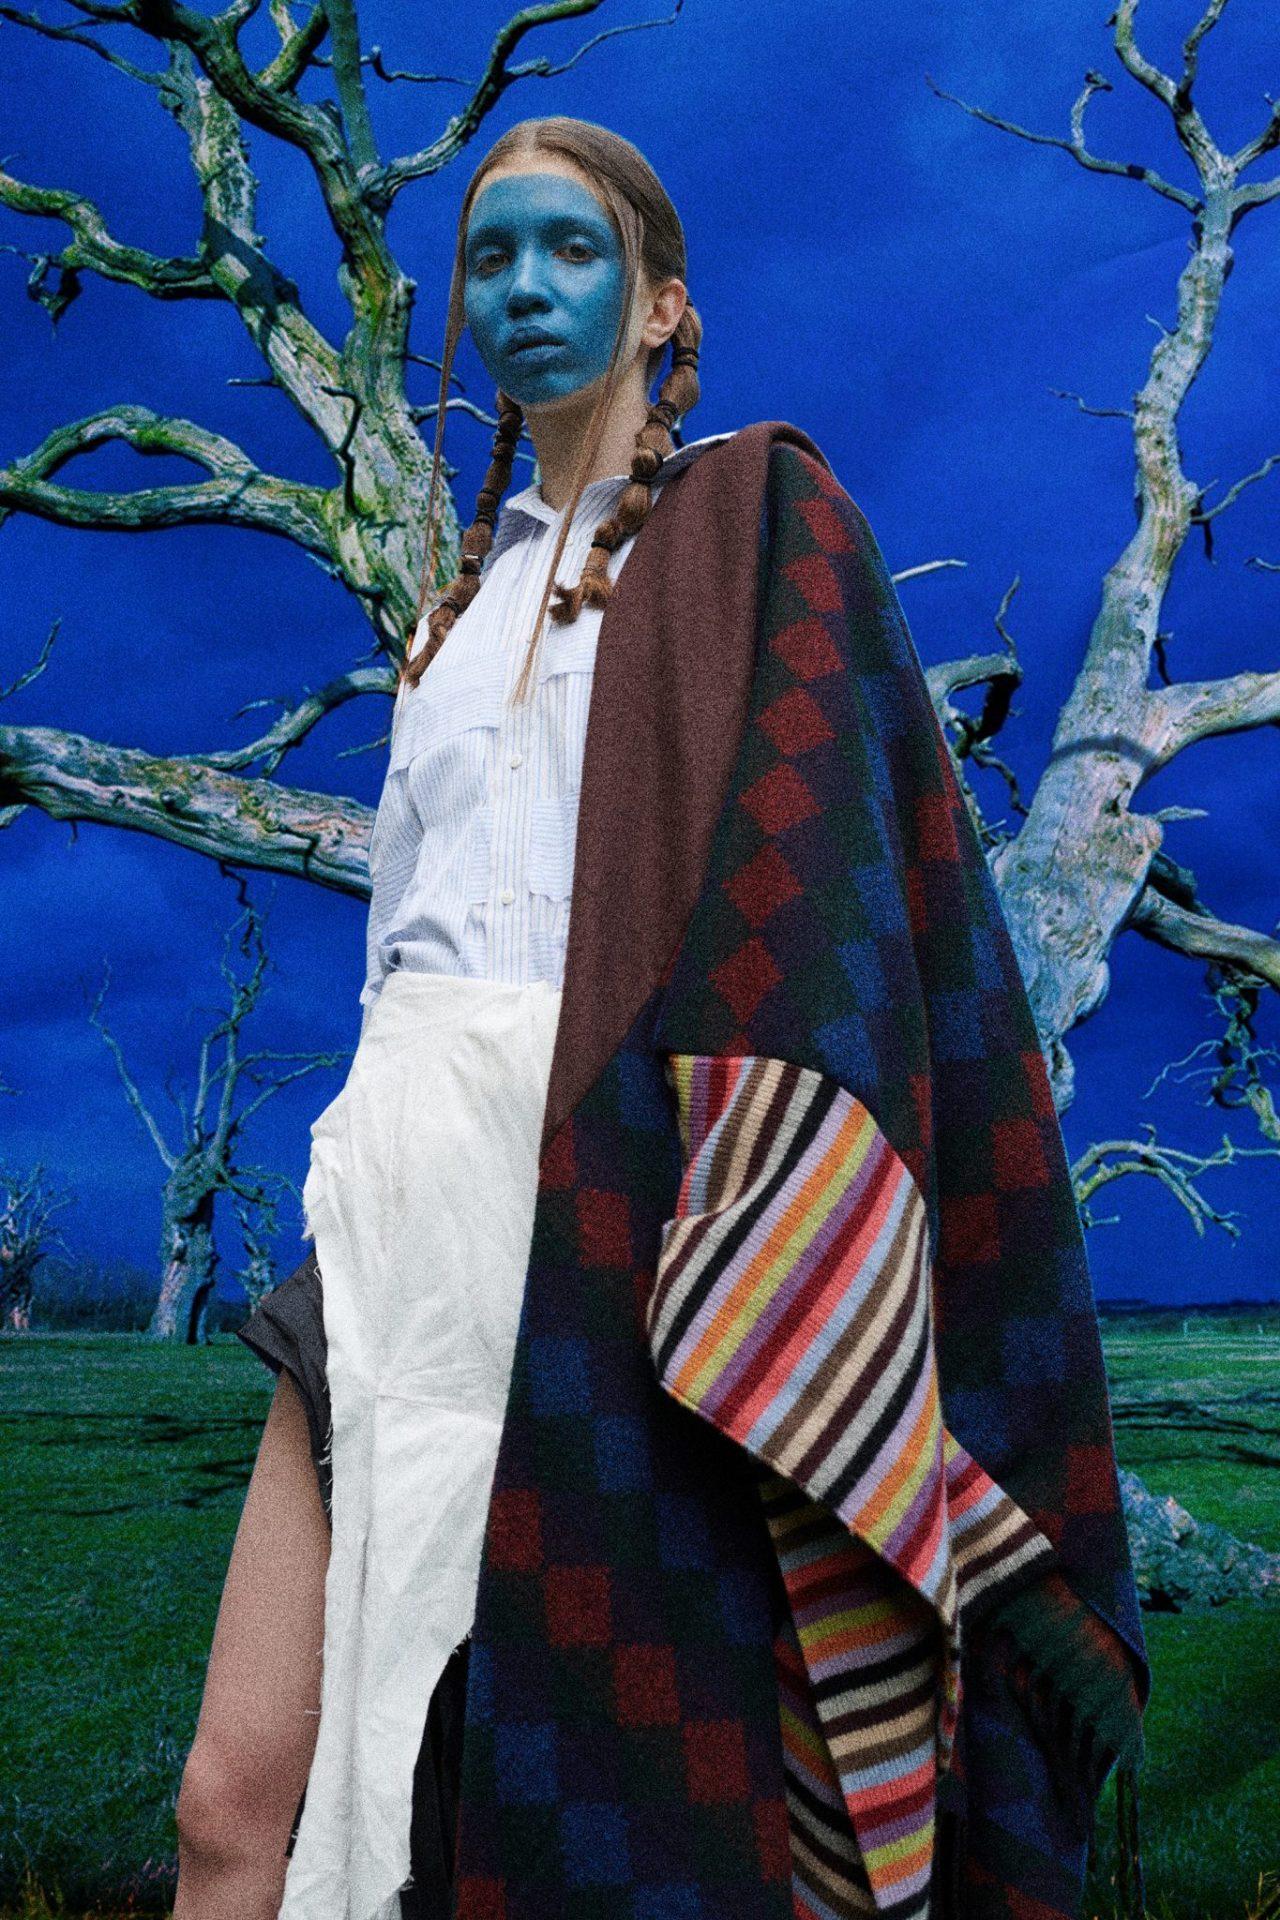 Alicja-Wesolowska-jungle-magazine-editorial-fashion